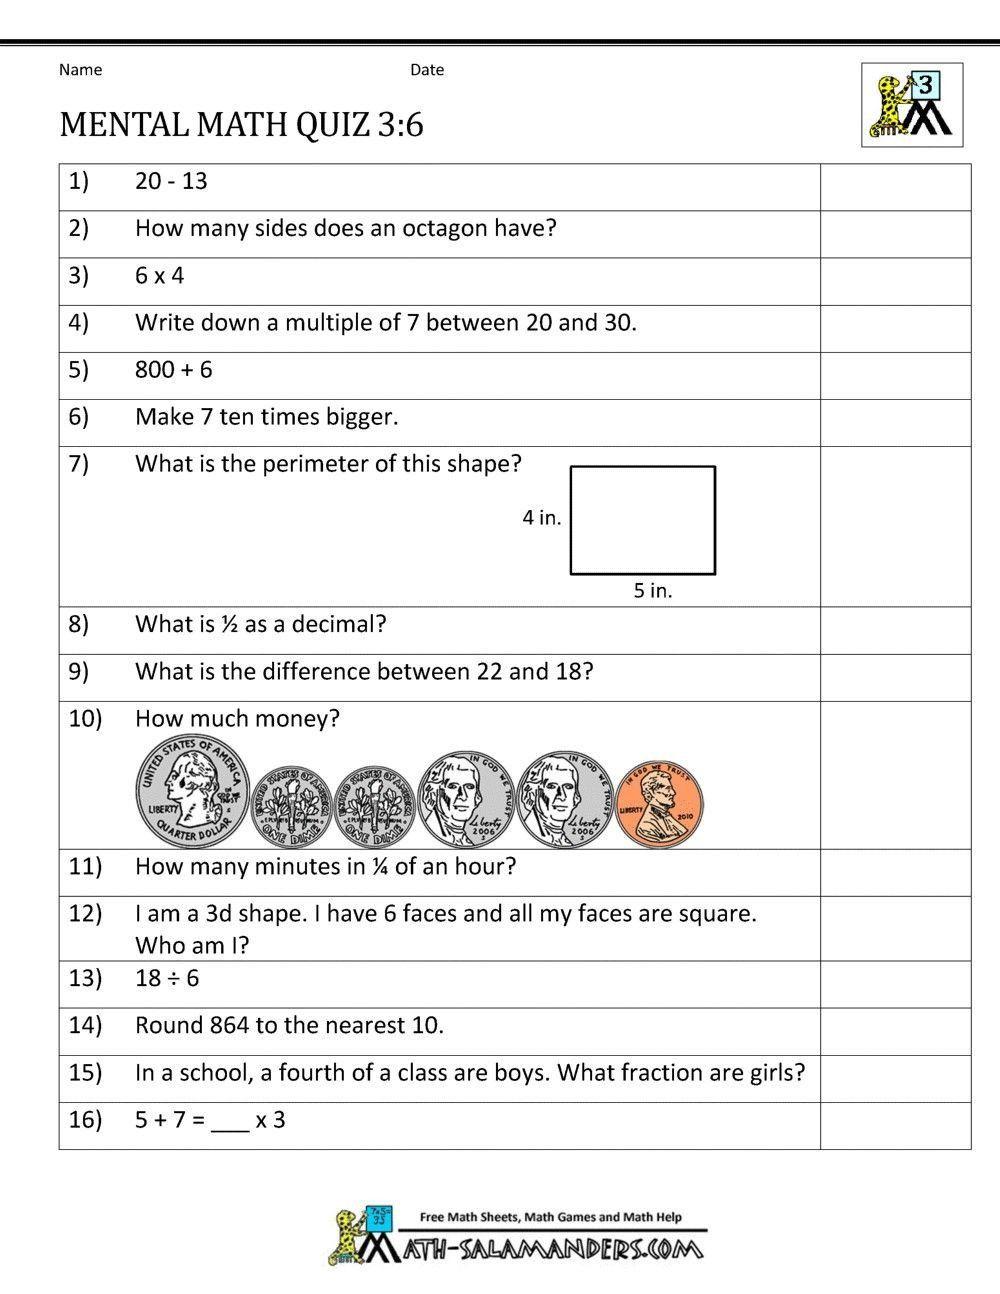 Mental Math Worksheets Grade 3 3 Worksheet Free Math Worksheets Third Grade 3 Measurement In 2020 Mental Math Mental Maths Worksheets Free Math Worksheets